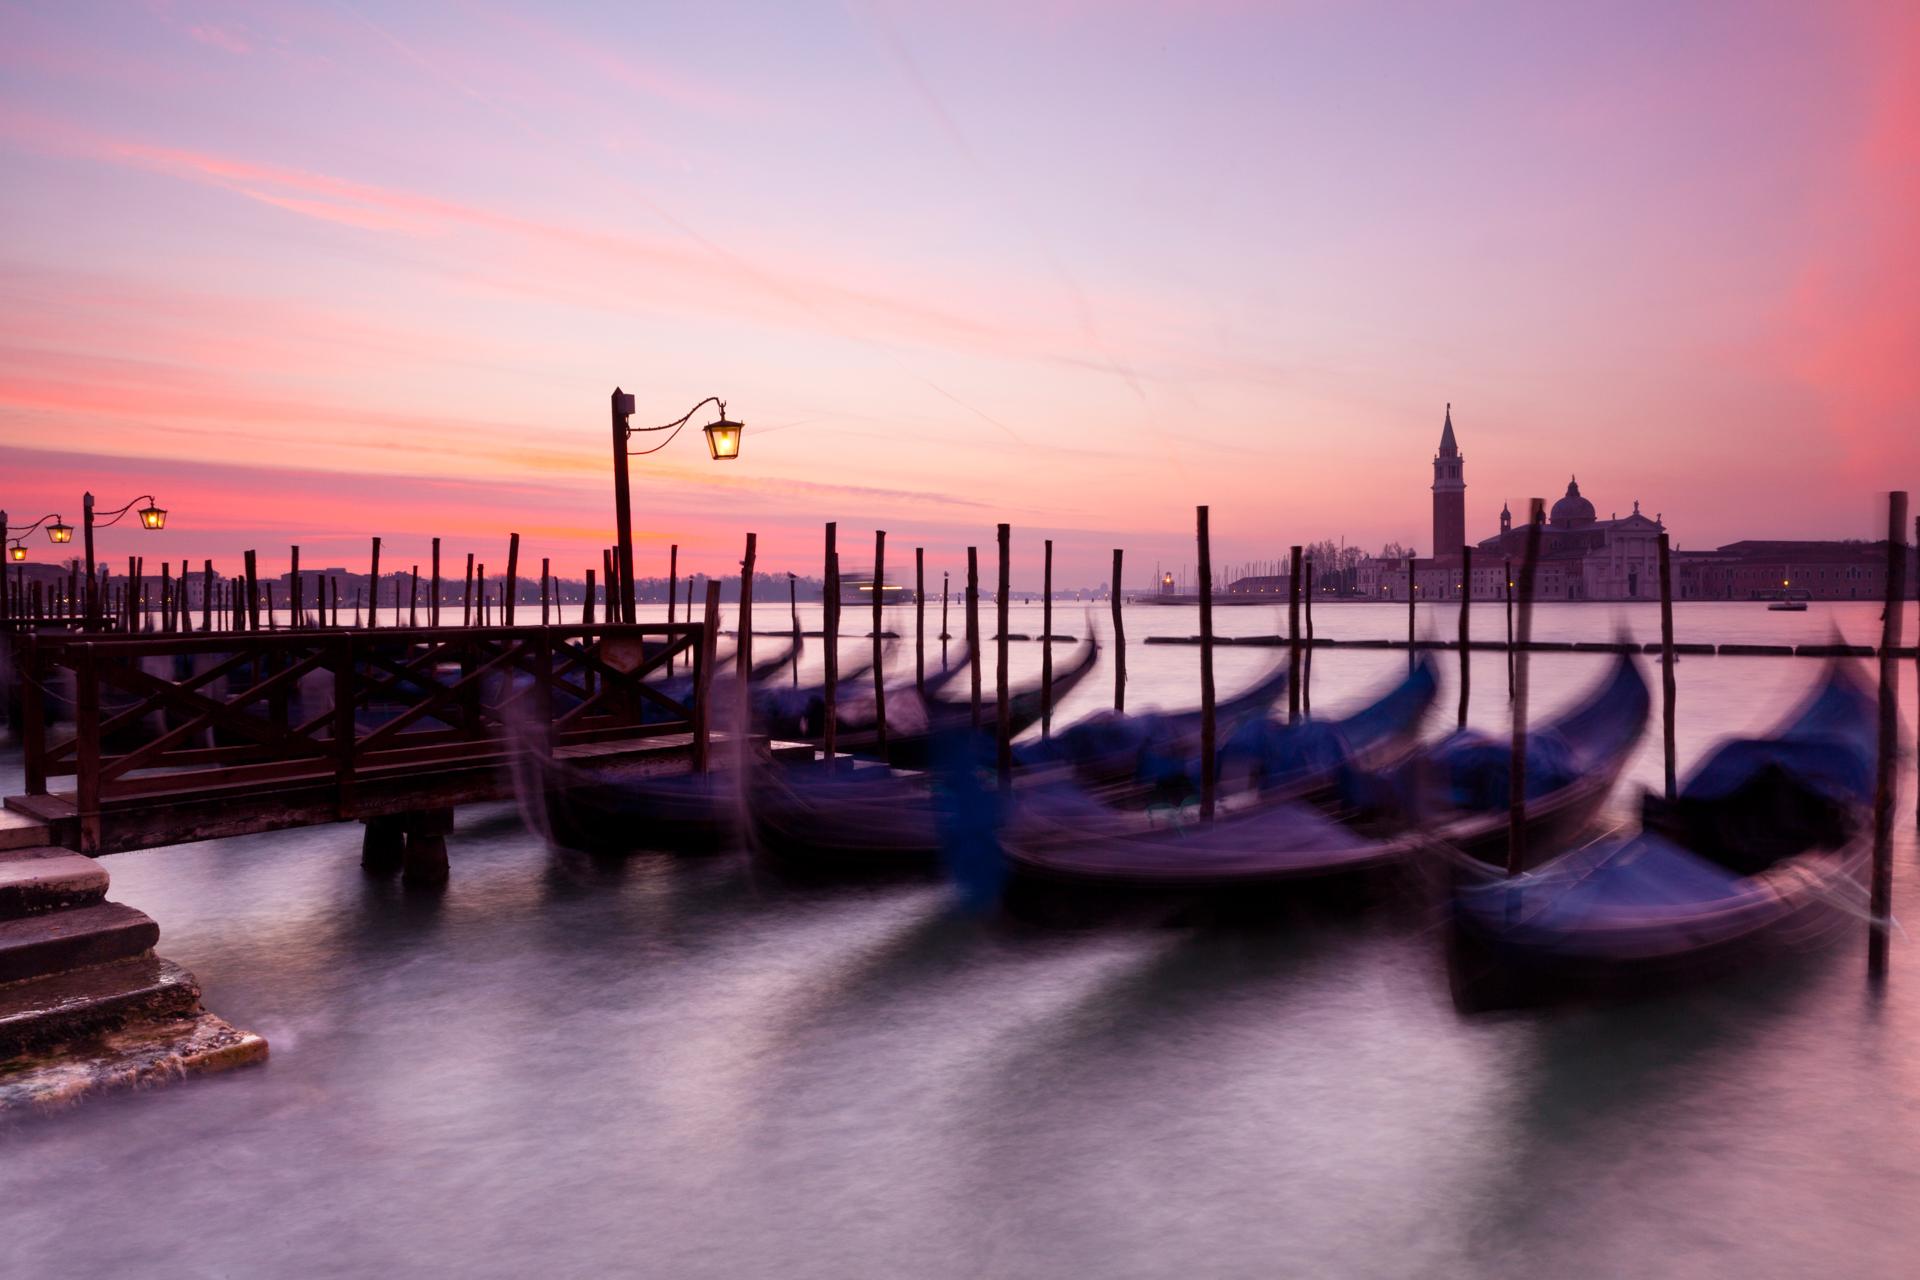 Venice at dusk in AdobeRGB color profile